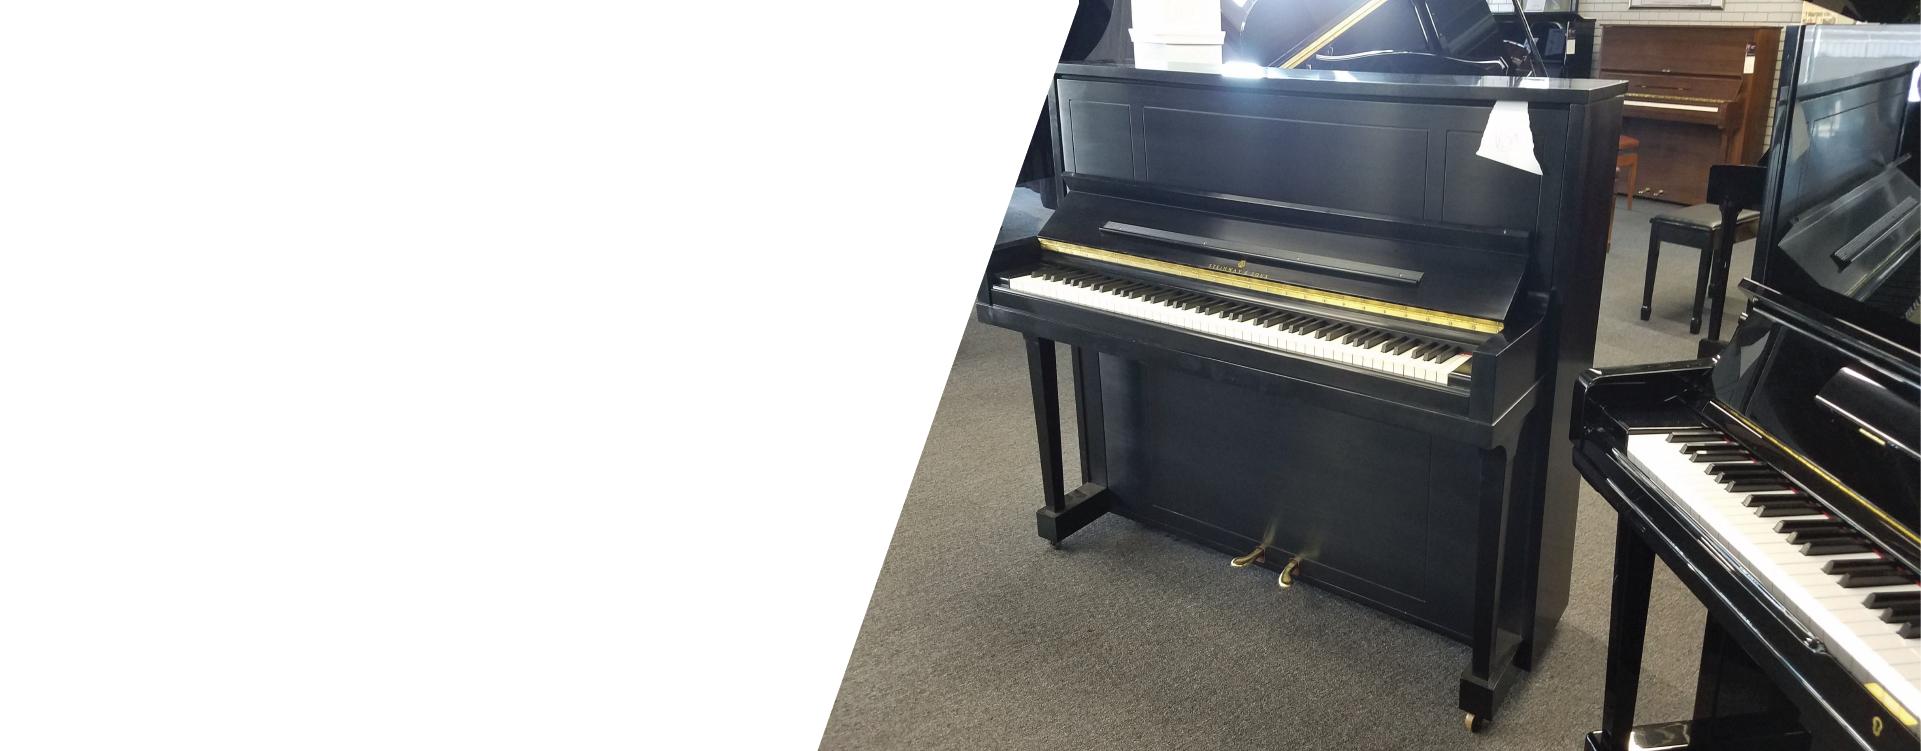 Vancouver Piano Movers 604-267-6487 www.piano911.ca Piano Moving Company